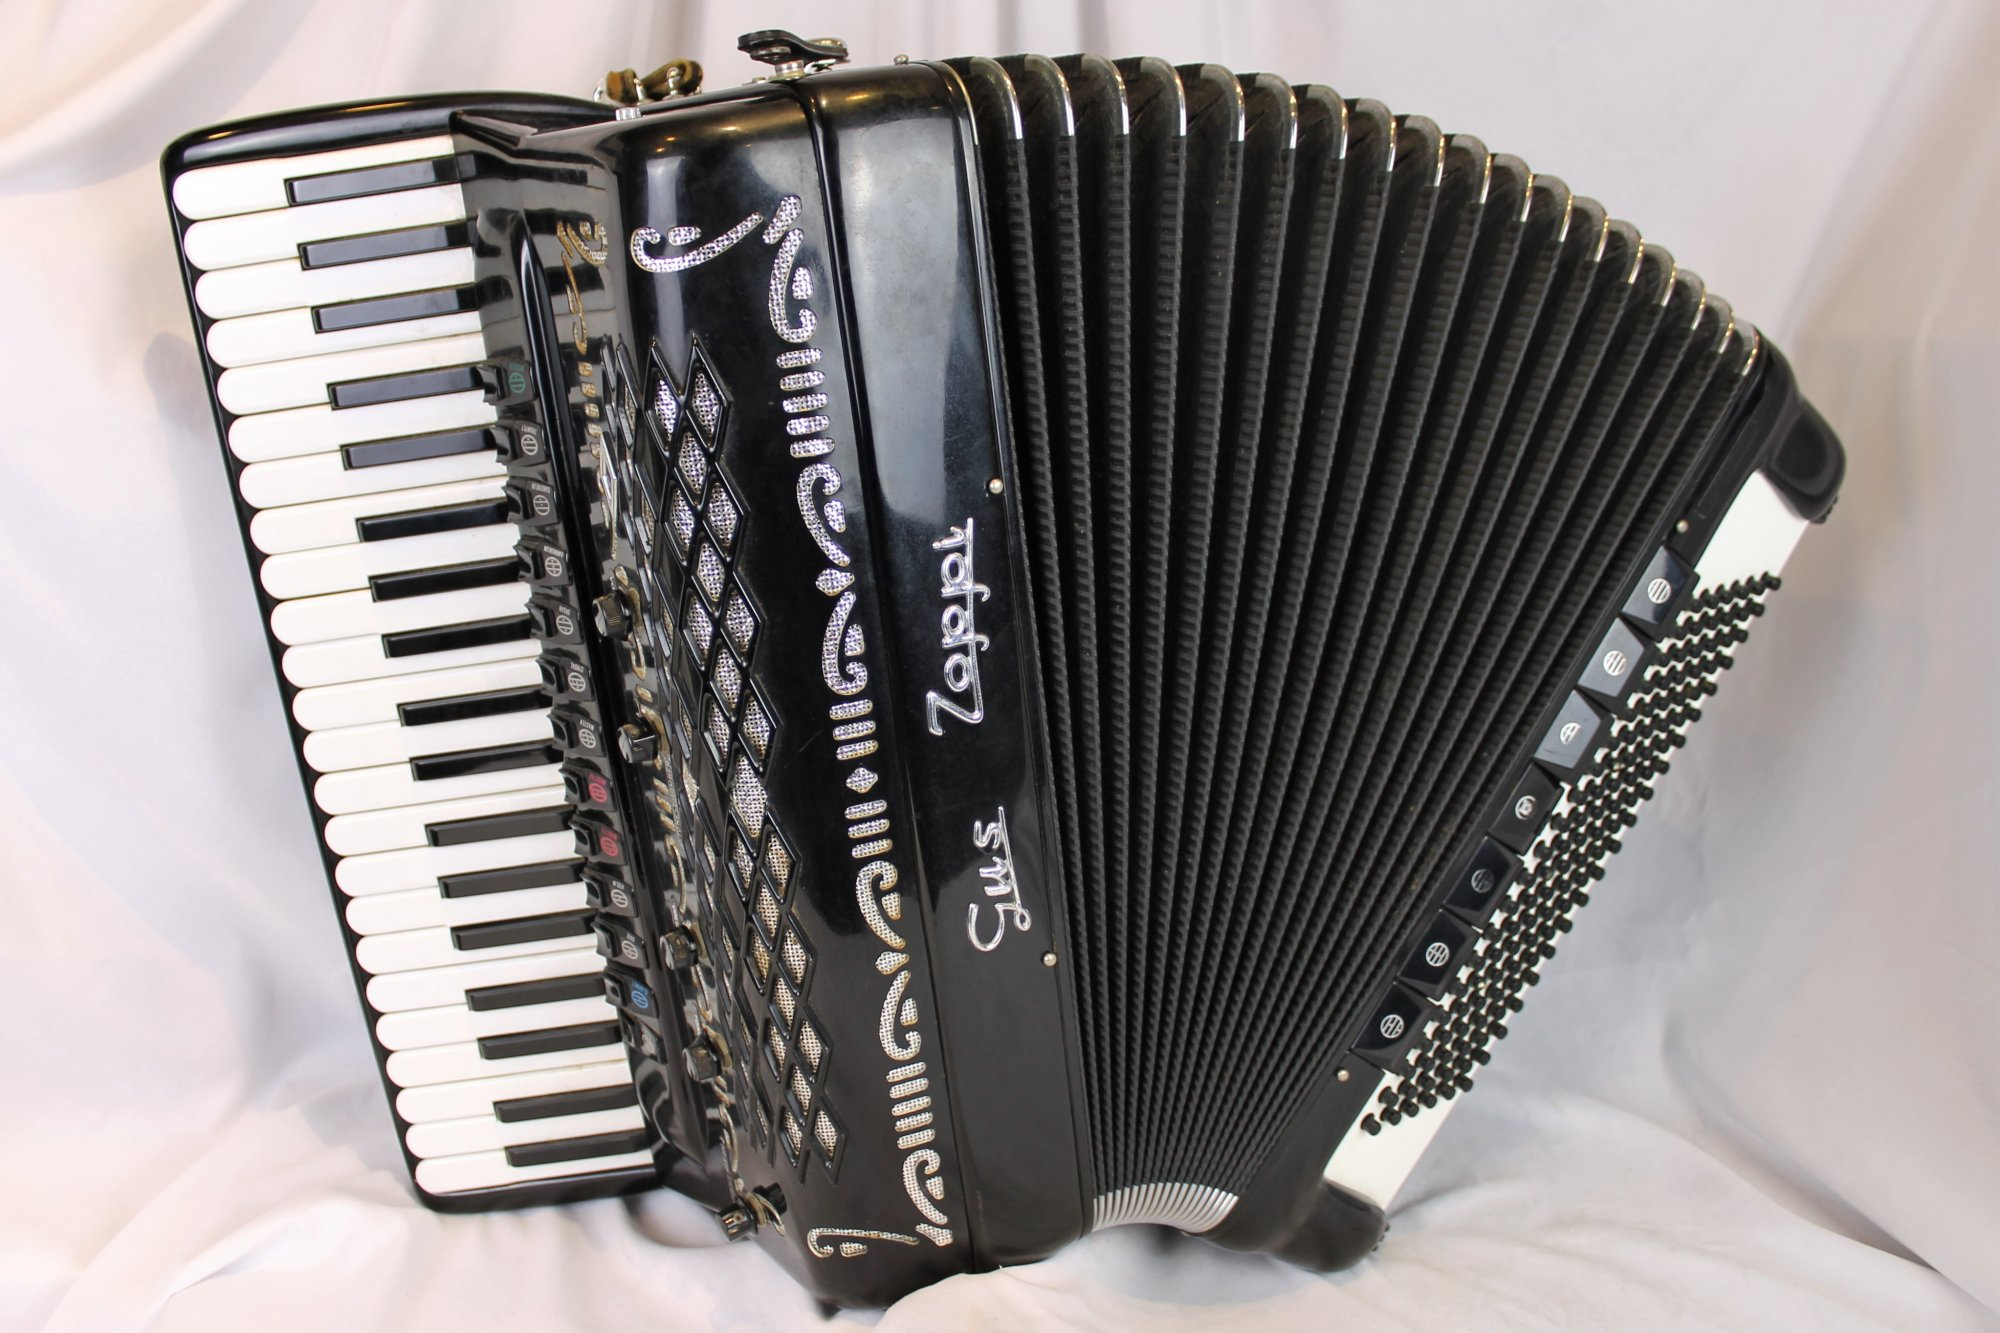 4806 - Black Borsini Gus Zoppi Piano Accordion LMMMH 41 120